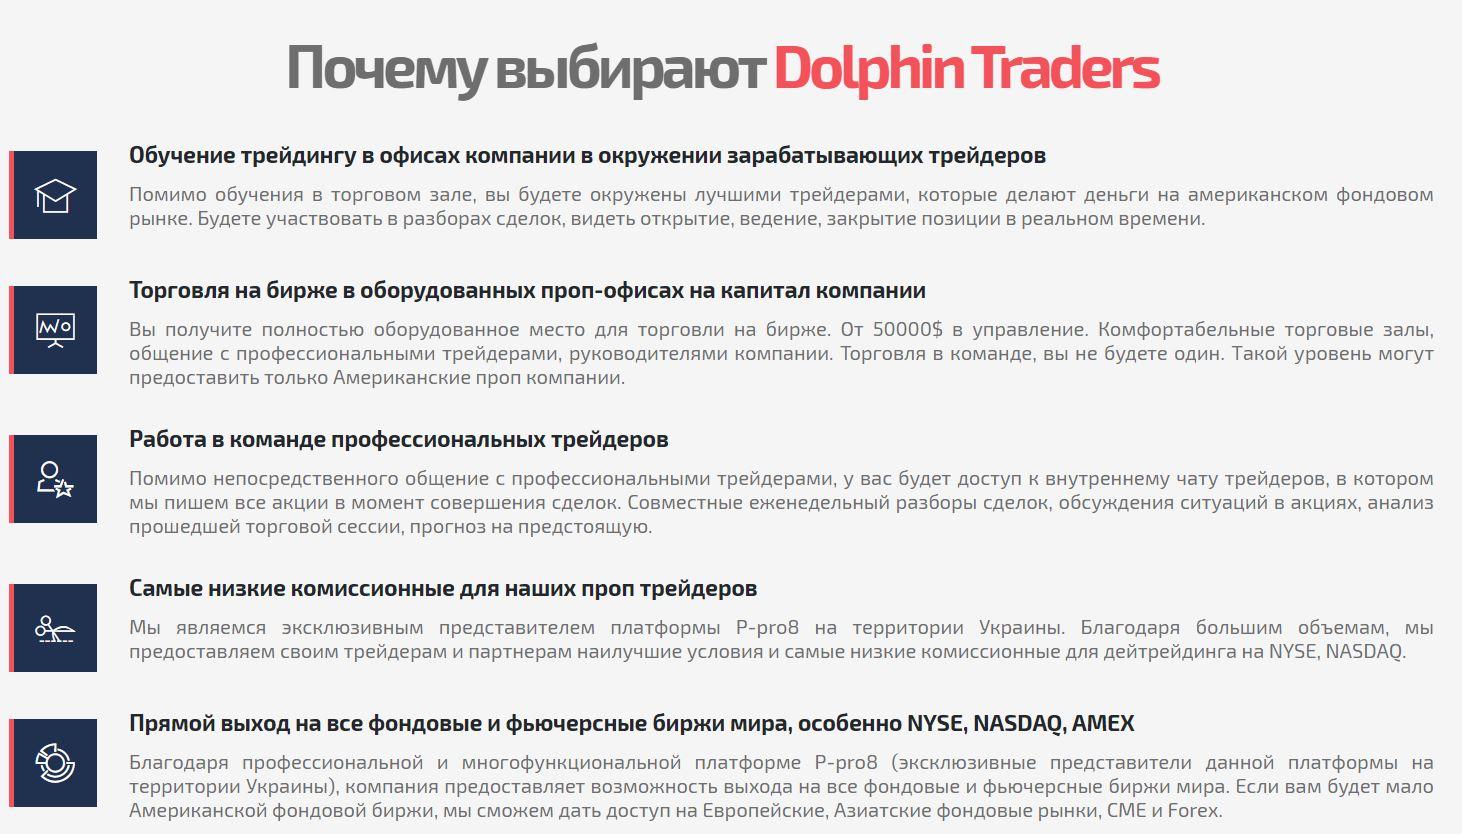 dolphin traders курсы трейдеров плюсы